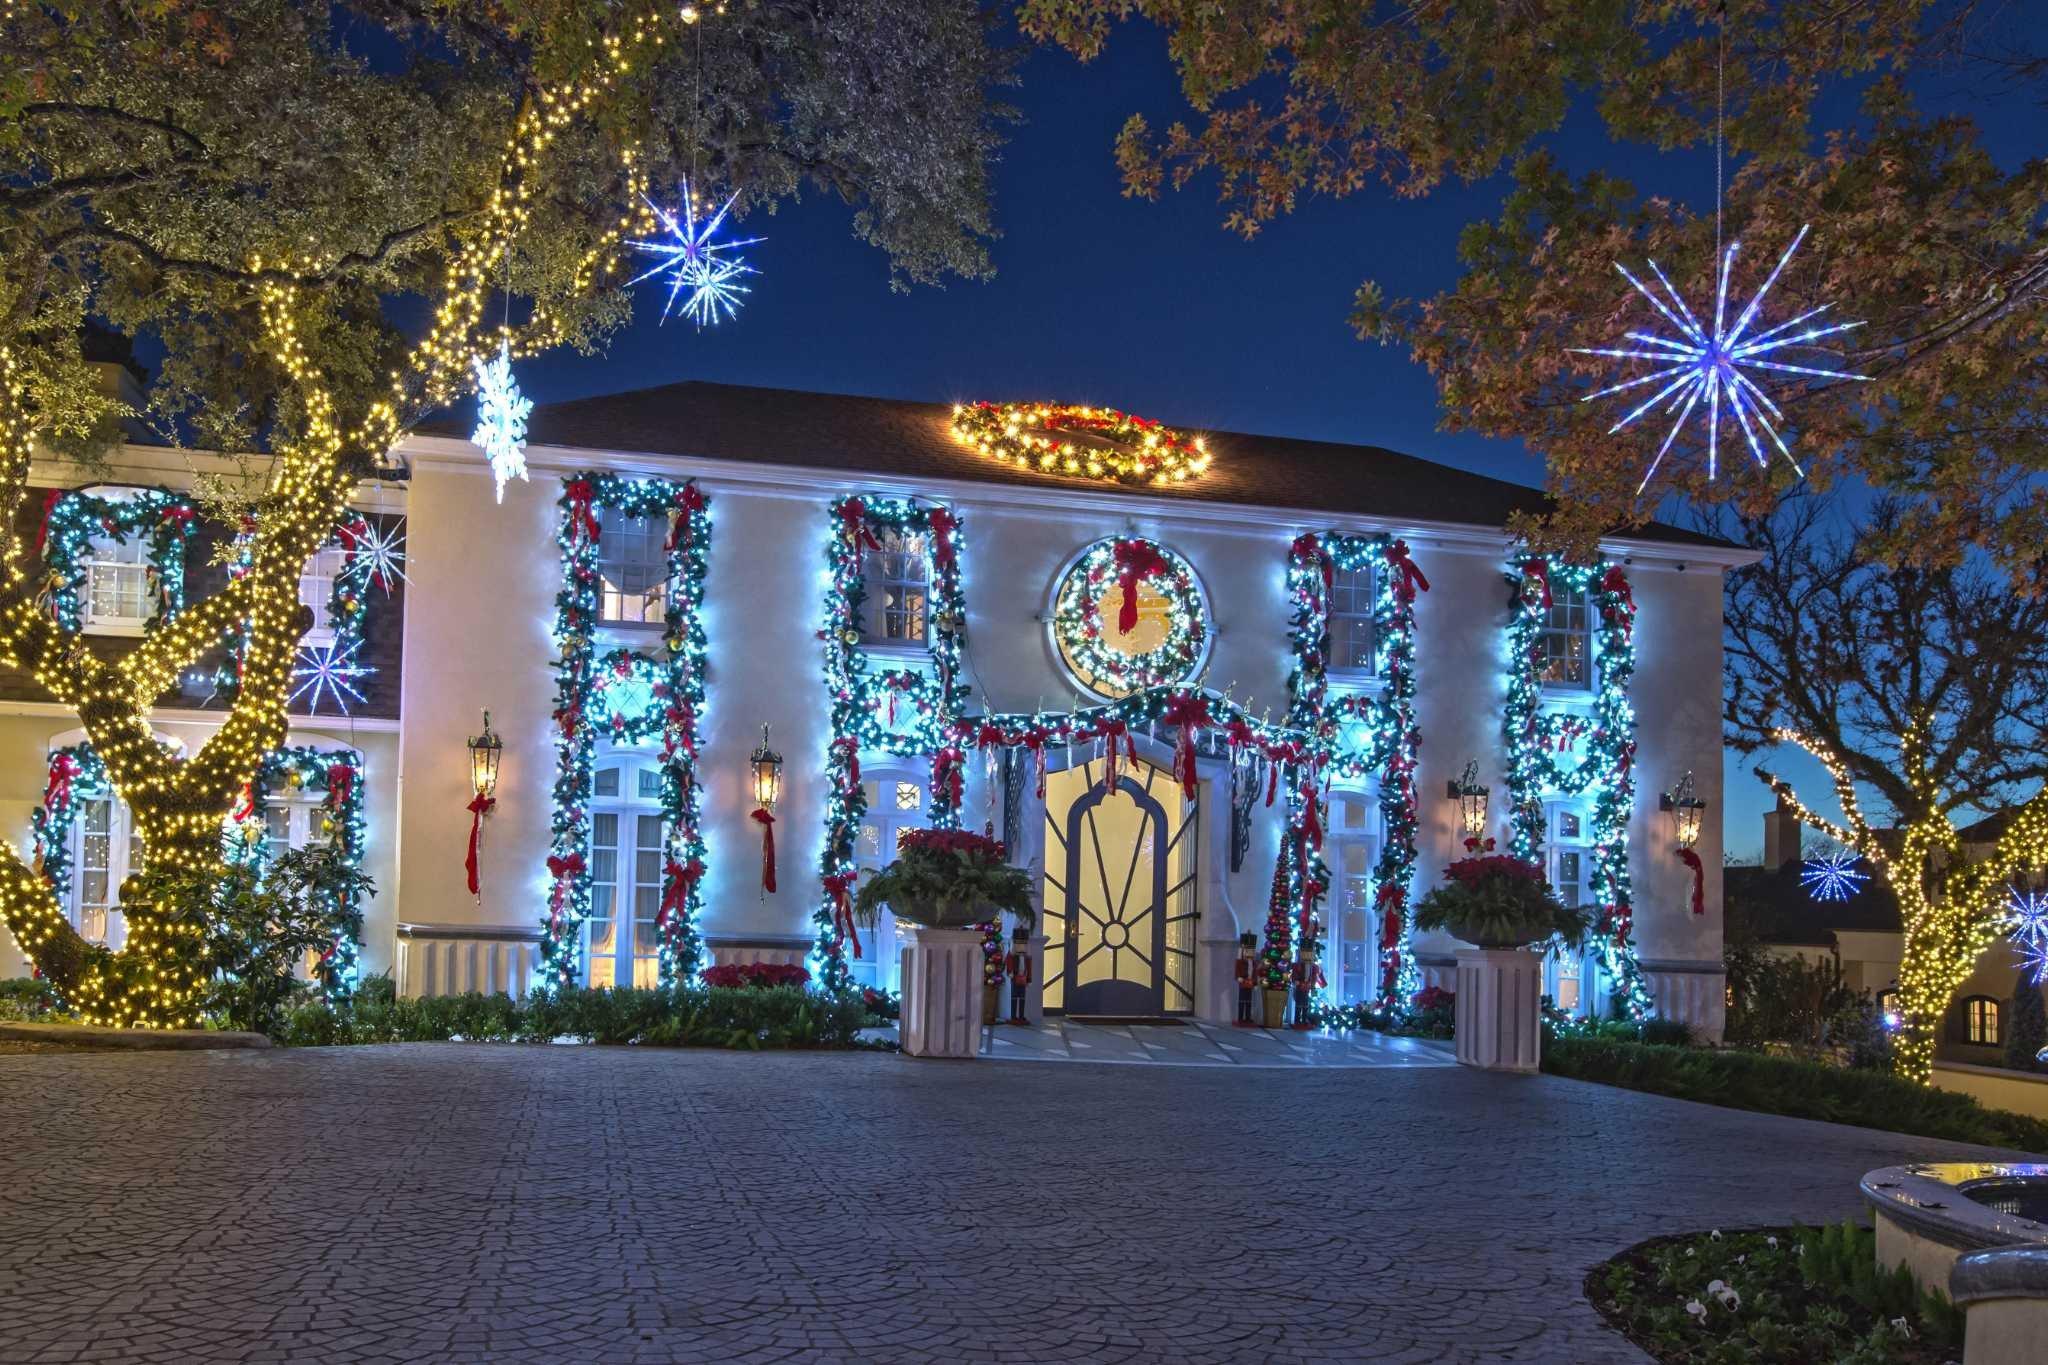 World Of Decor San Antonio Elegant Christmas Decor A Peek Inside San Antonio's Most Lavishly Decorated Homes Expressnews